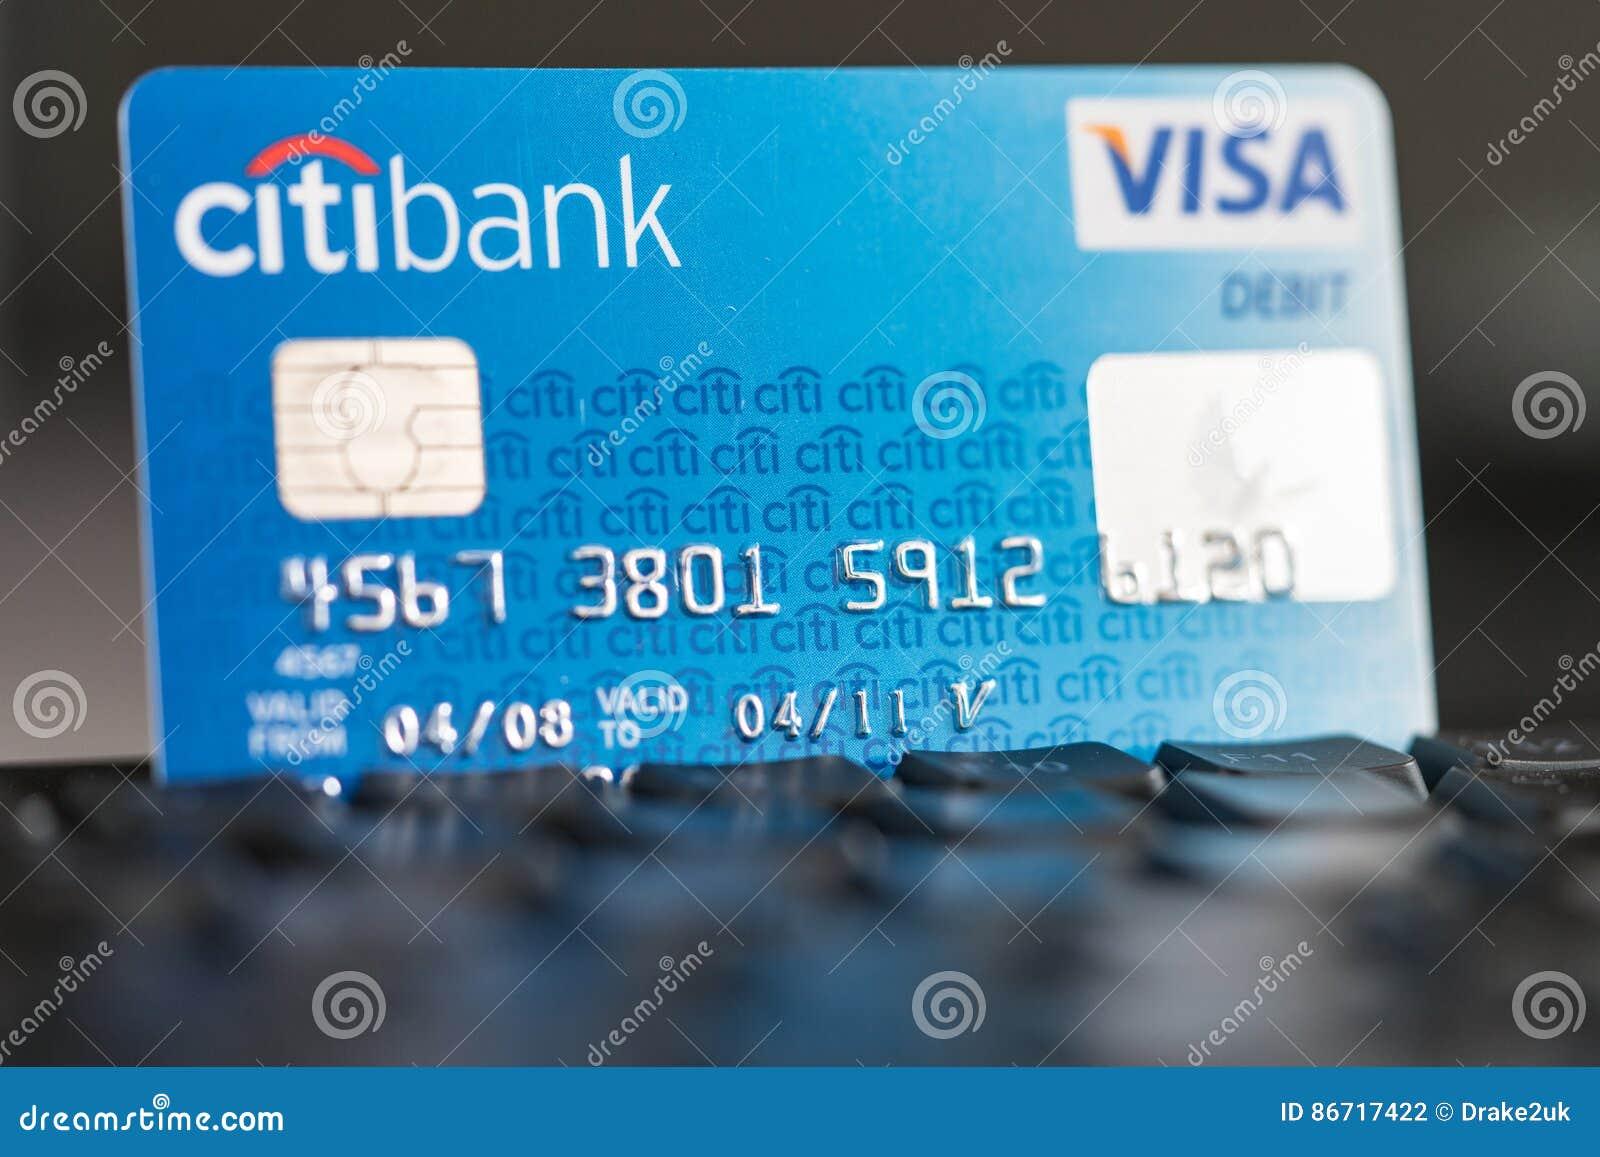 Citibank Visa Debit Card On A Keyboard Editorial Photography